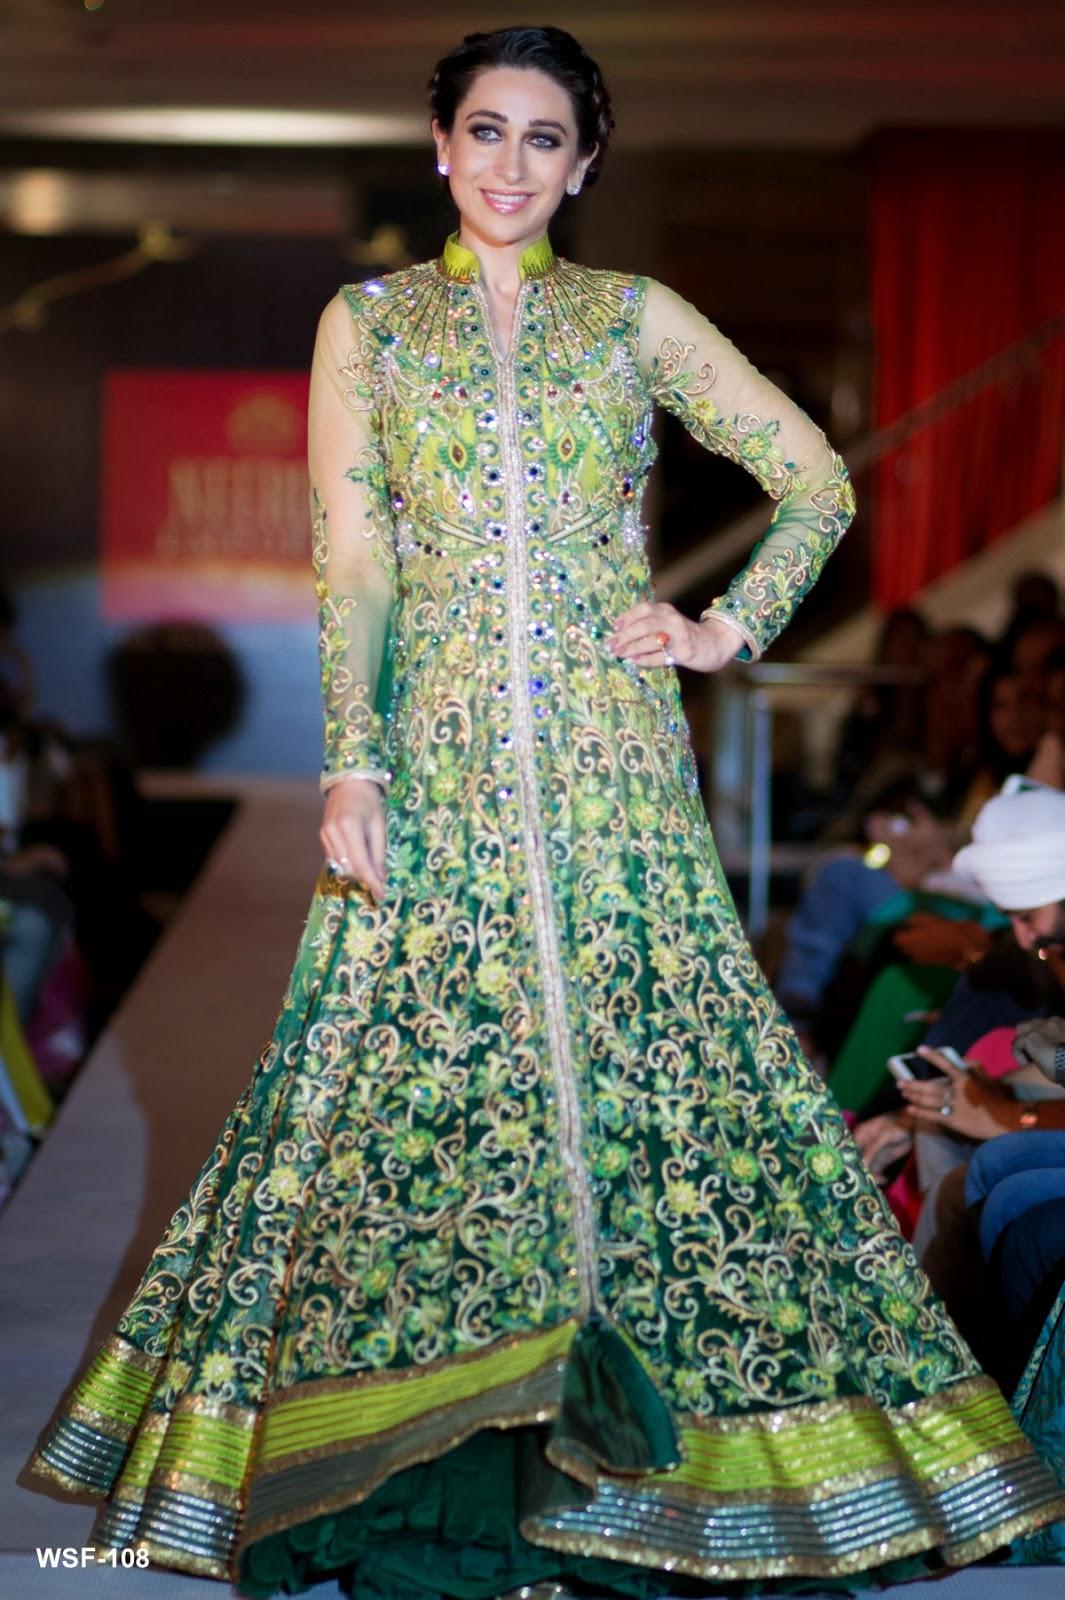 Karisma Kapoor in Green Bridal Dress